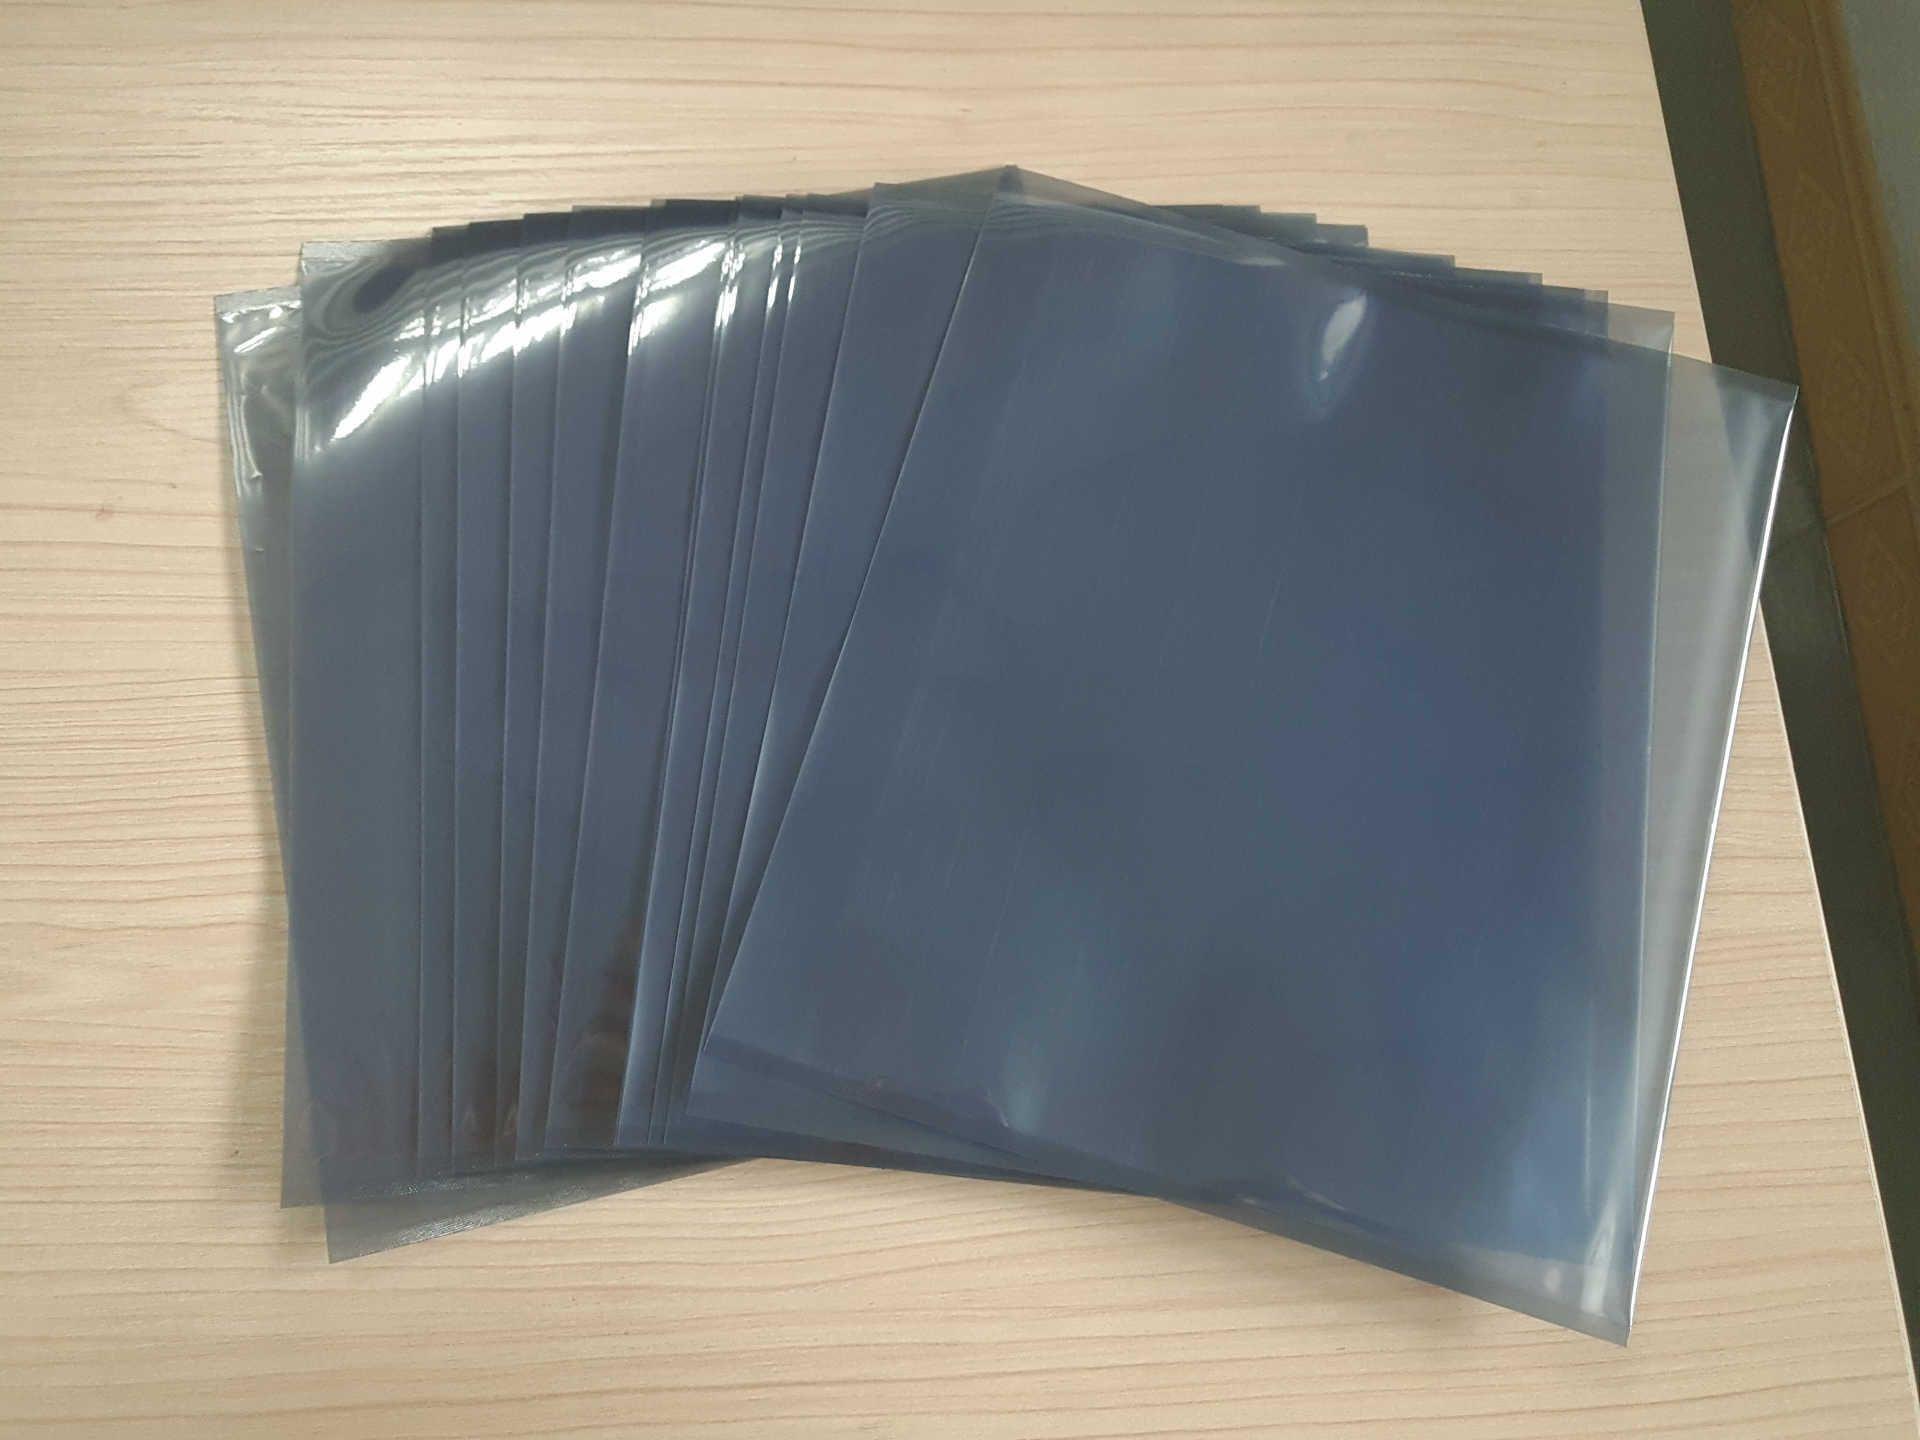 100pcs/Lot 16x25cm Anti Static Shielding Plastic Storage Packaging Bags ESD  Anti-Static Pack Bag Open Top Antistatic Package Bag